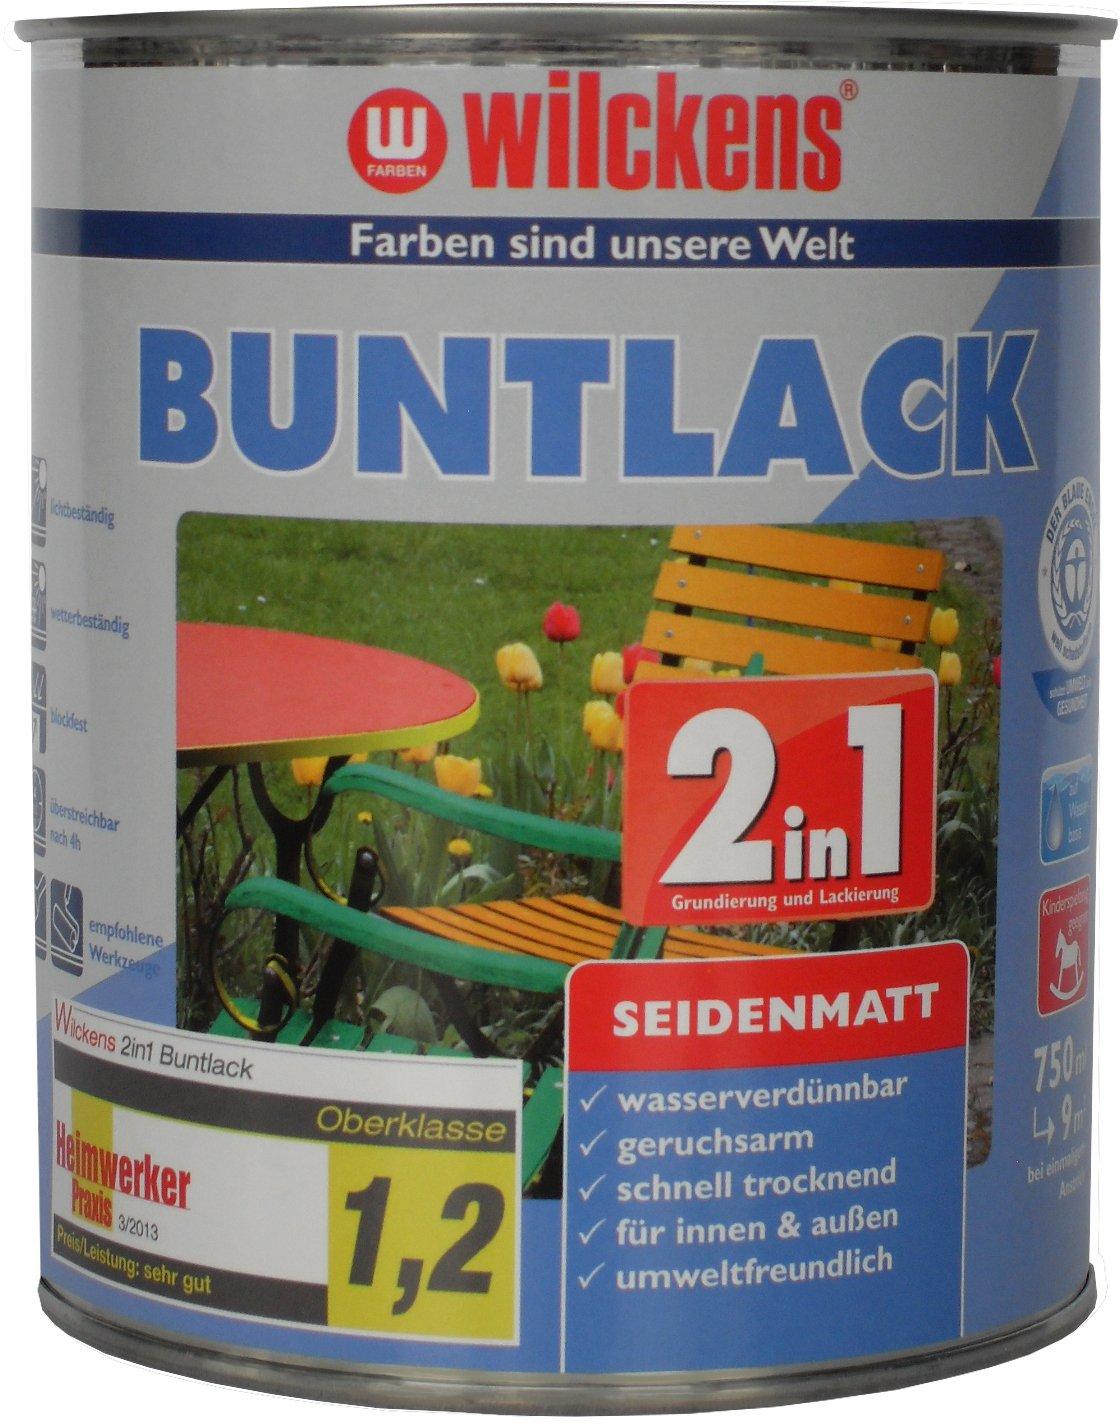 Wilckens 2in1 Buntlack seidenmatt, RAL 9005 tiefschwarz, 750 ml 12490500050